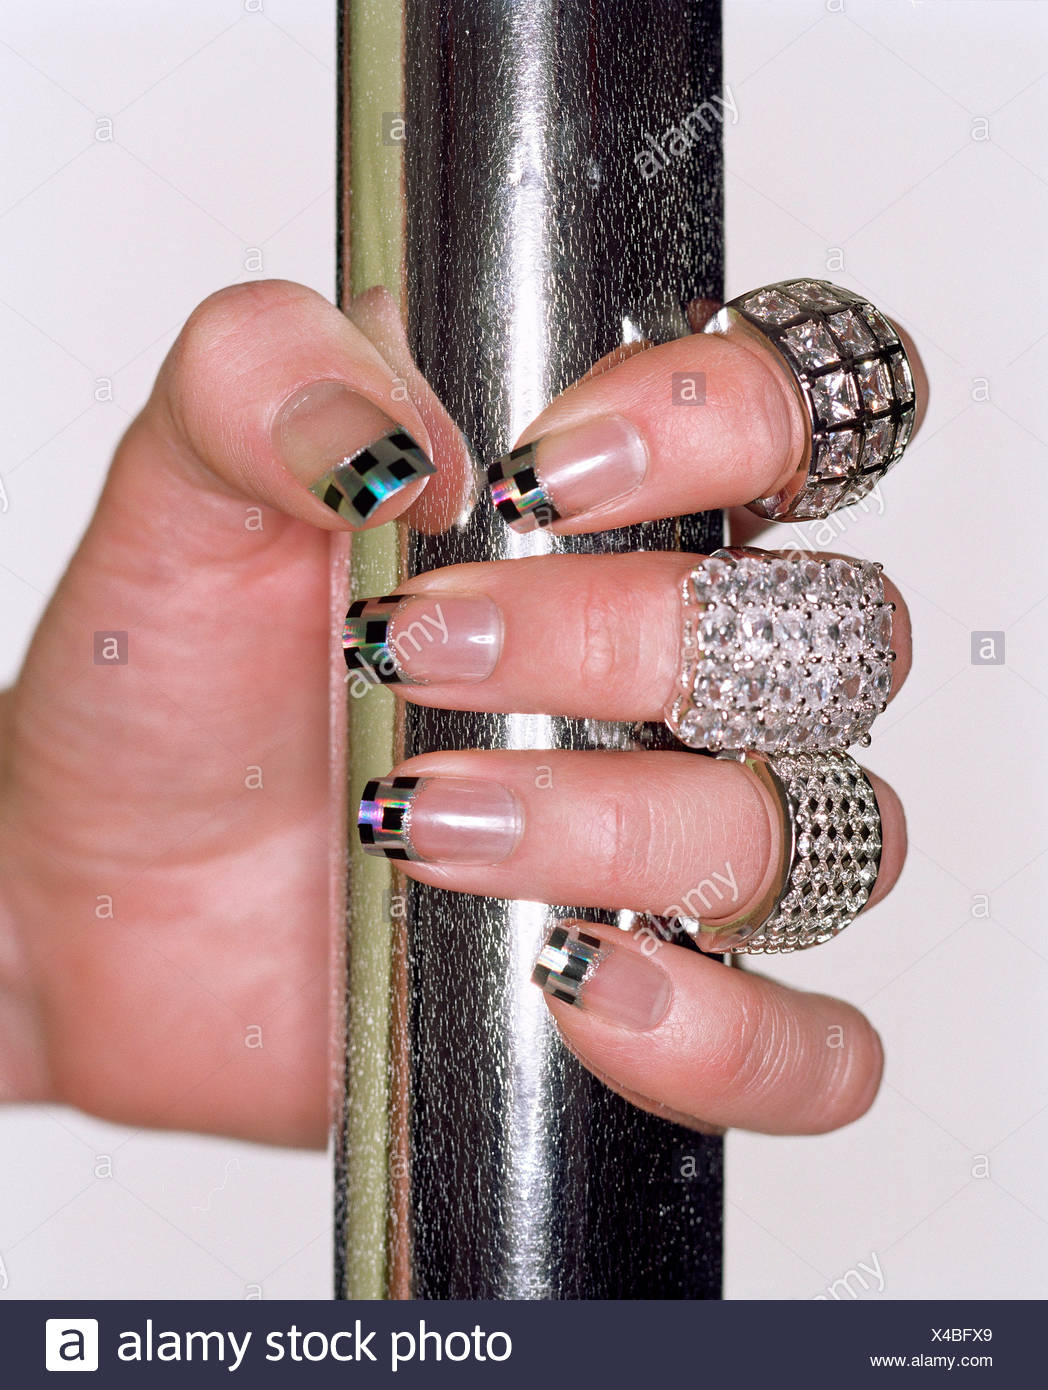 Silver Nails Stockfotos & Silver Nails Bilder - Alamy